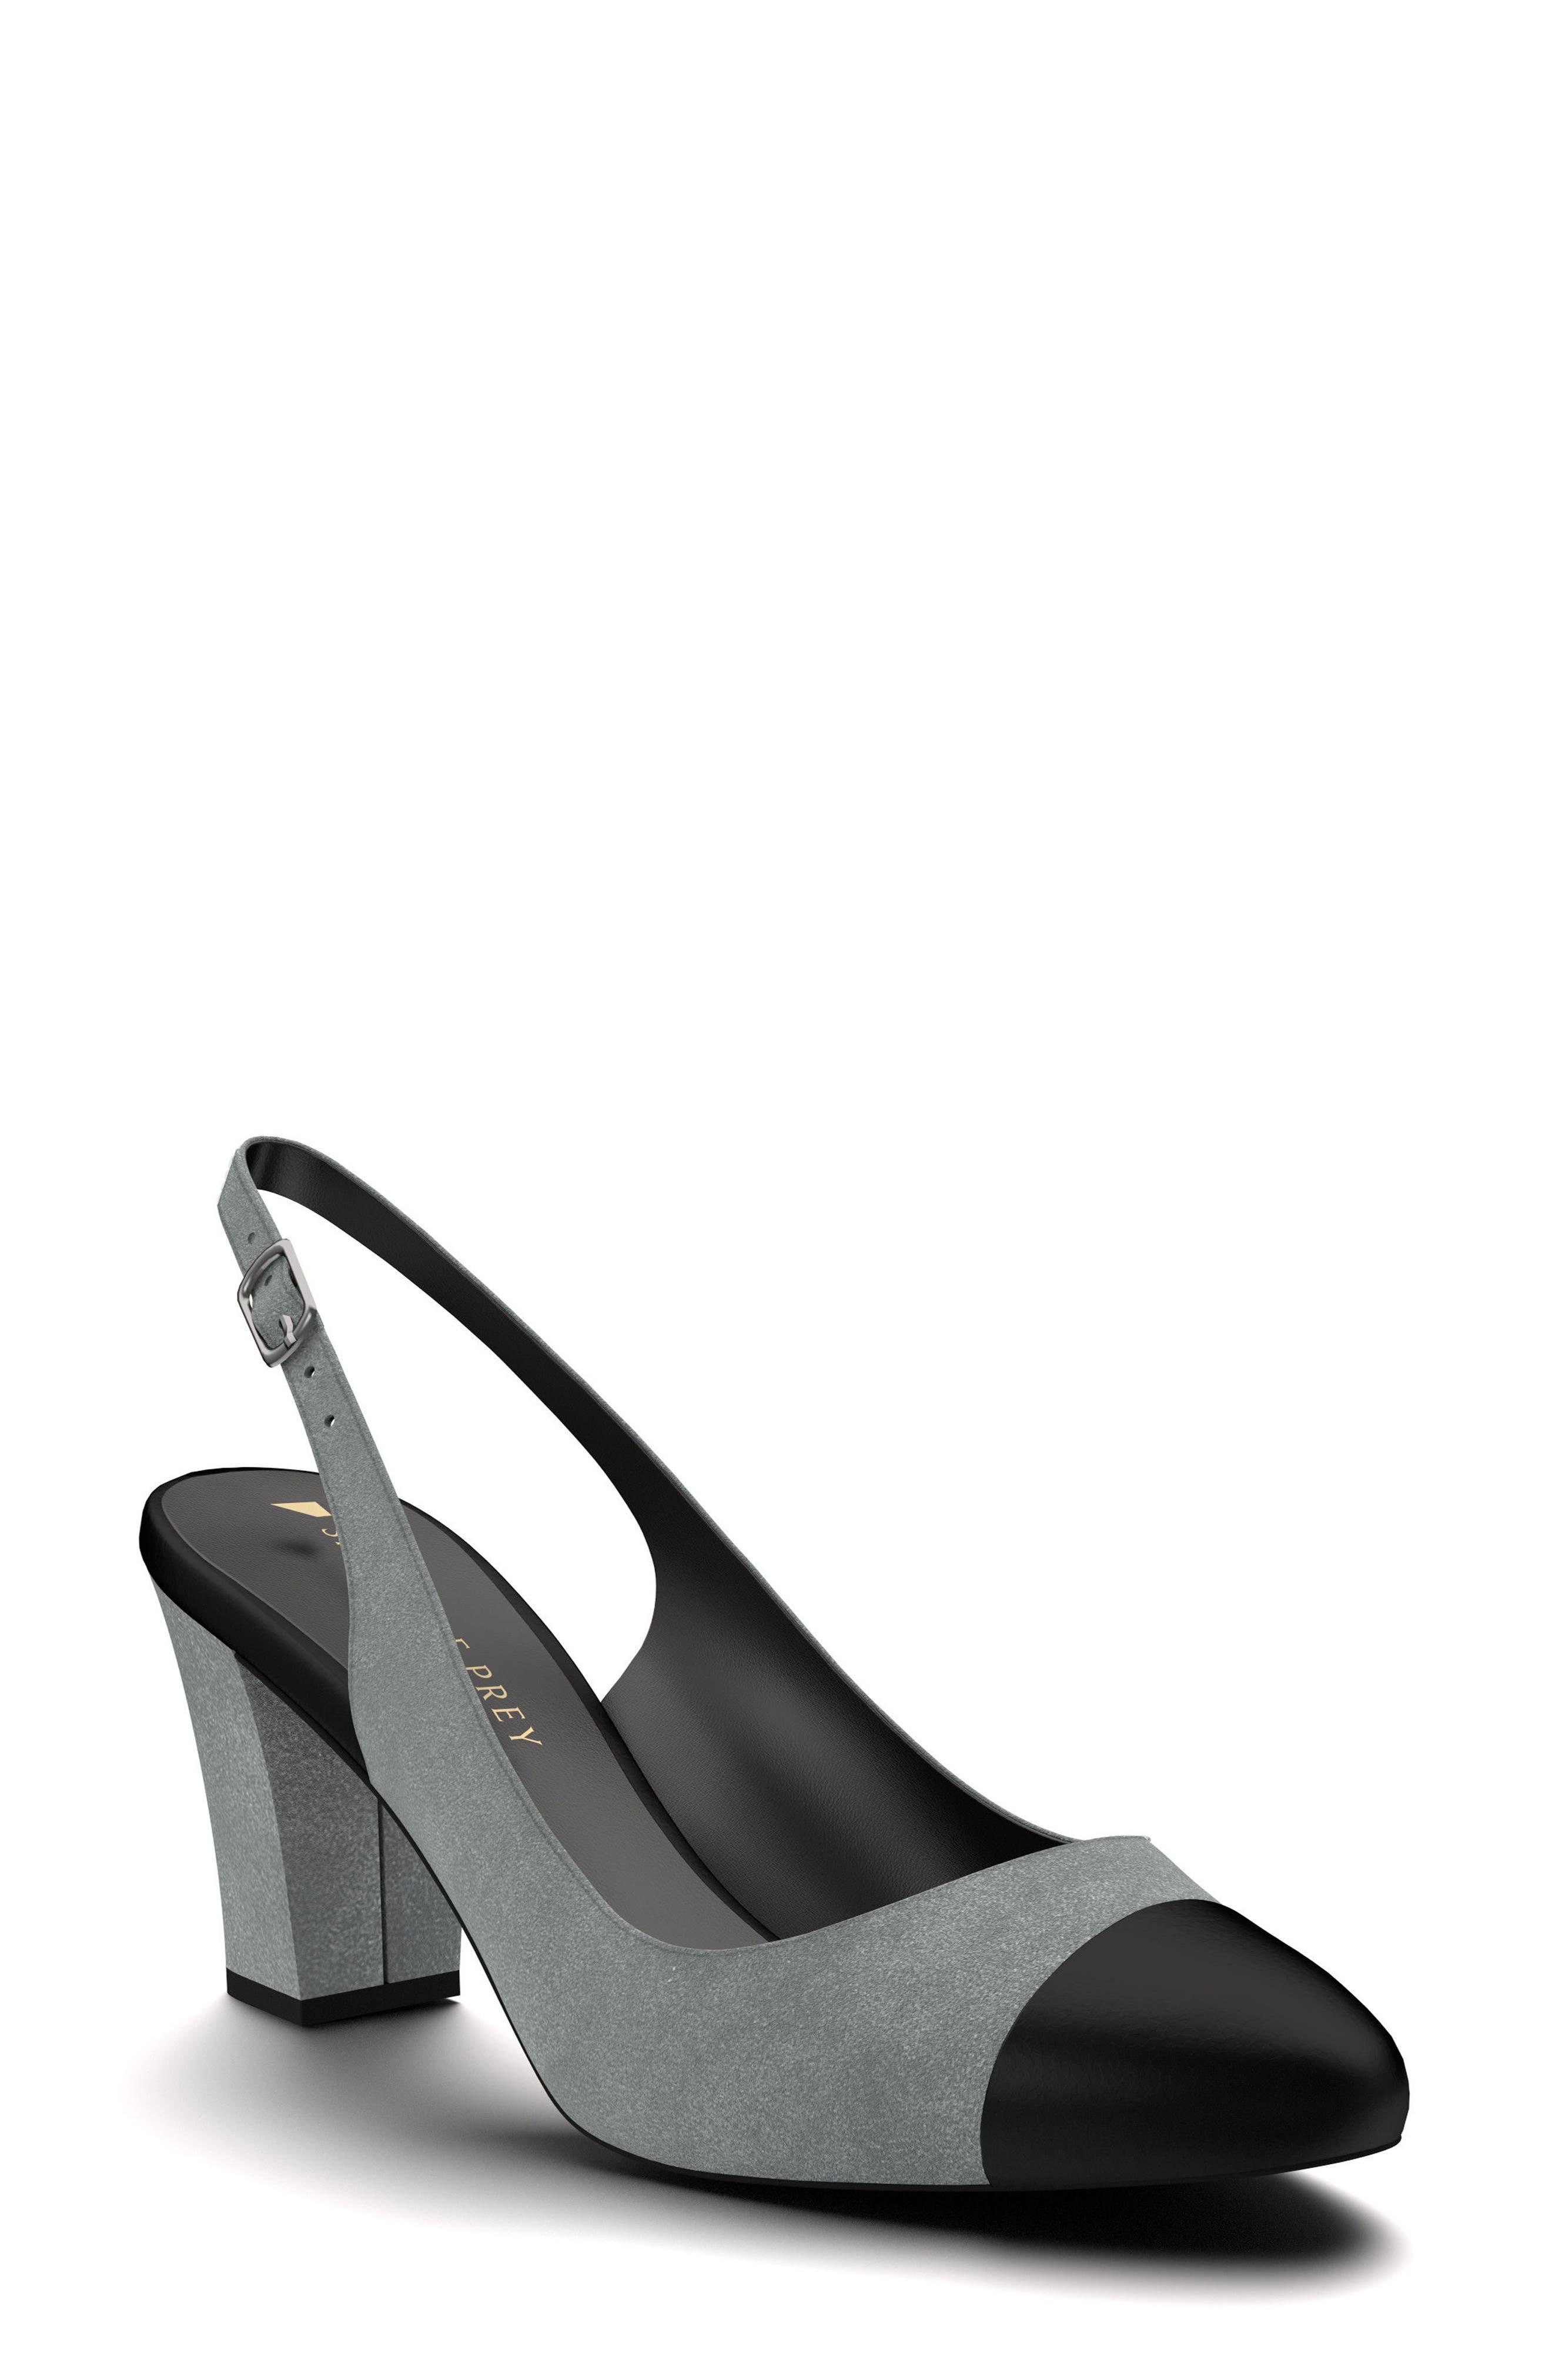 Alternate Image 1 Selected - Shoes of Prey Slingback Pump (Women)